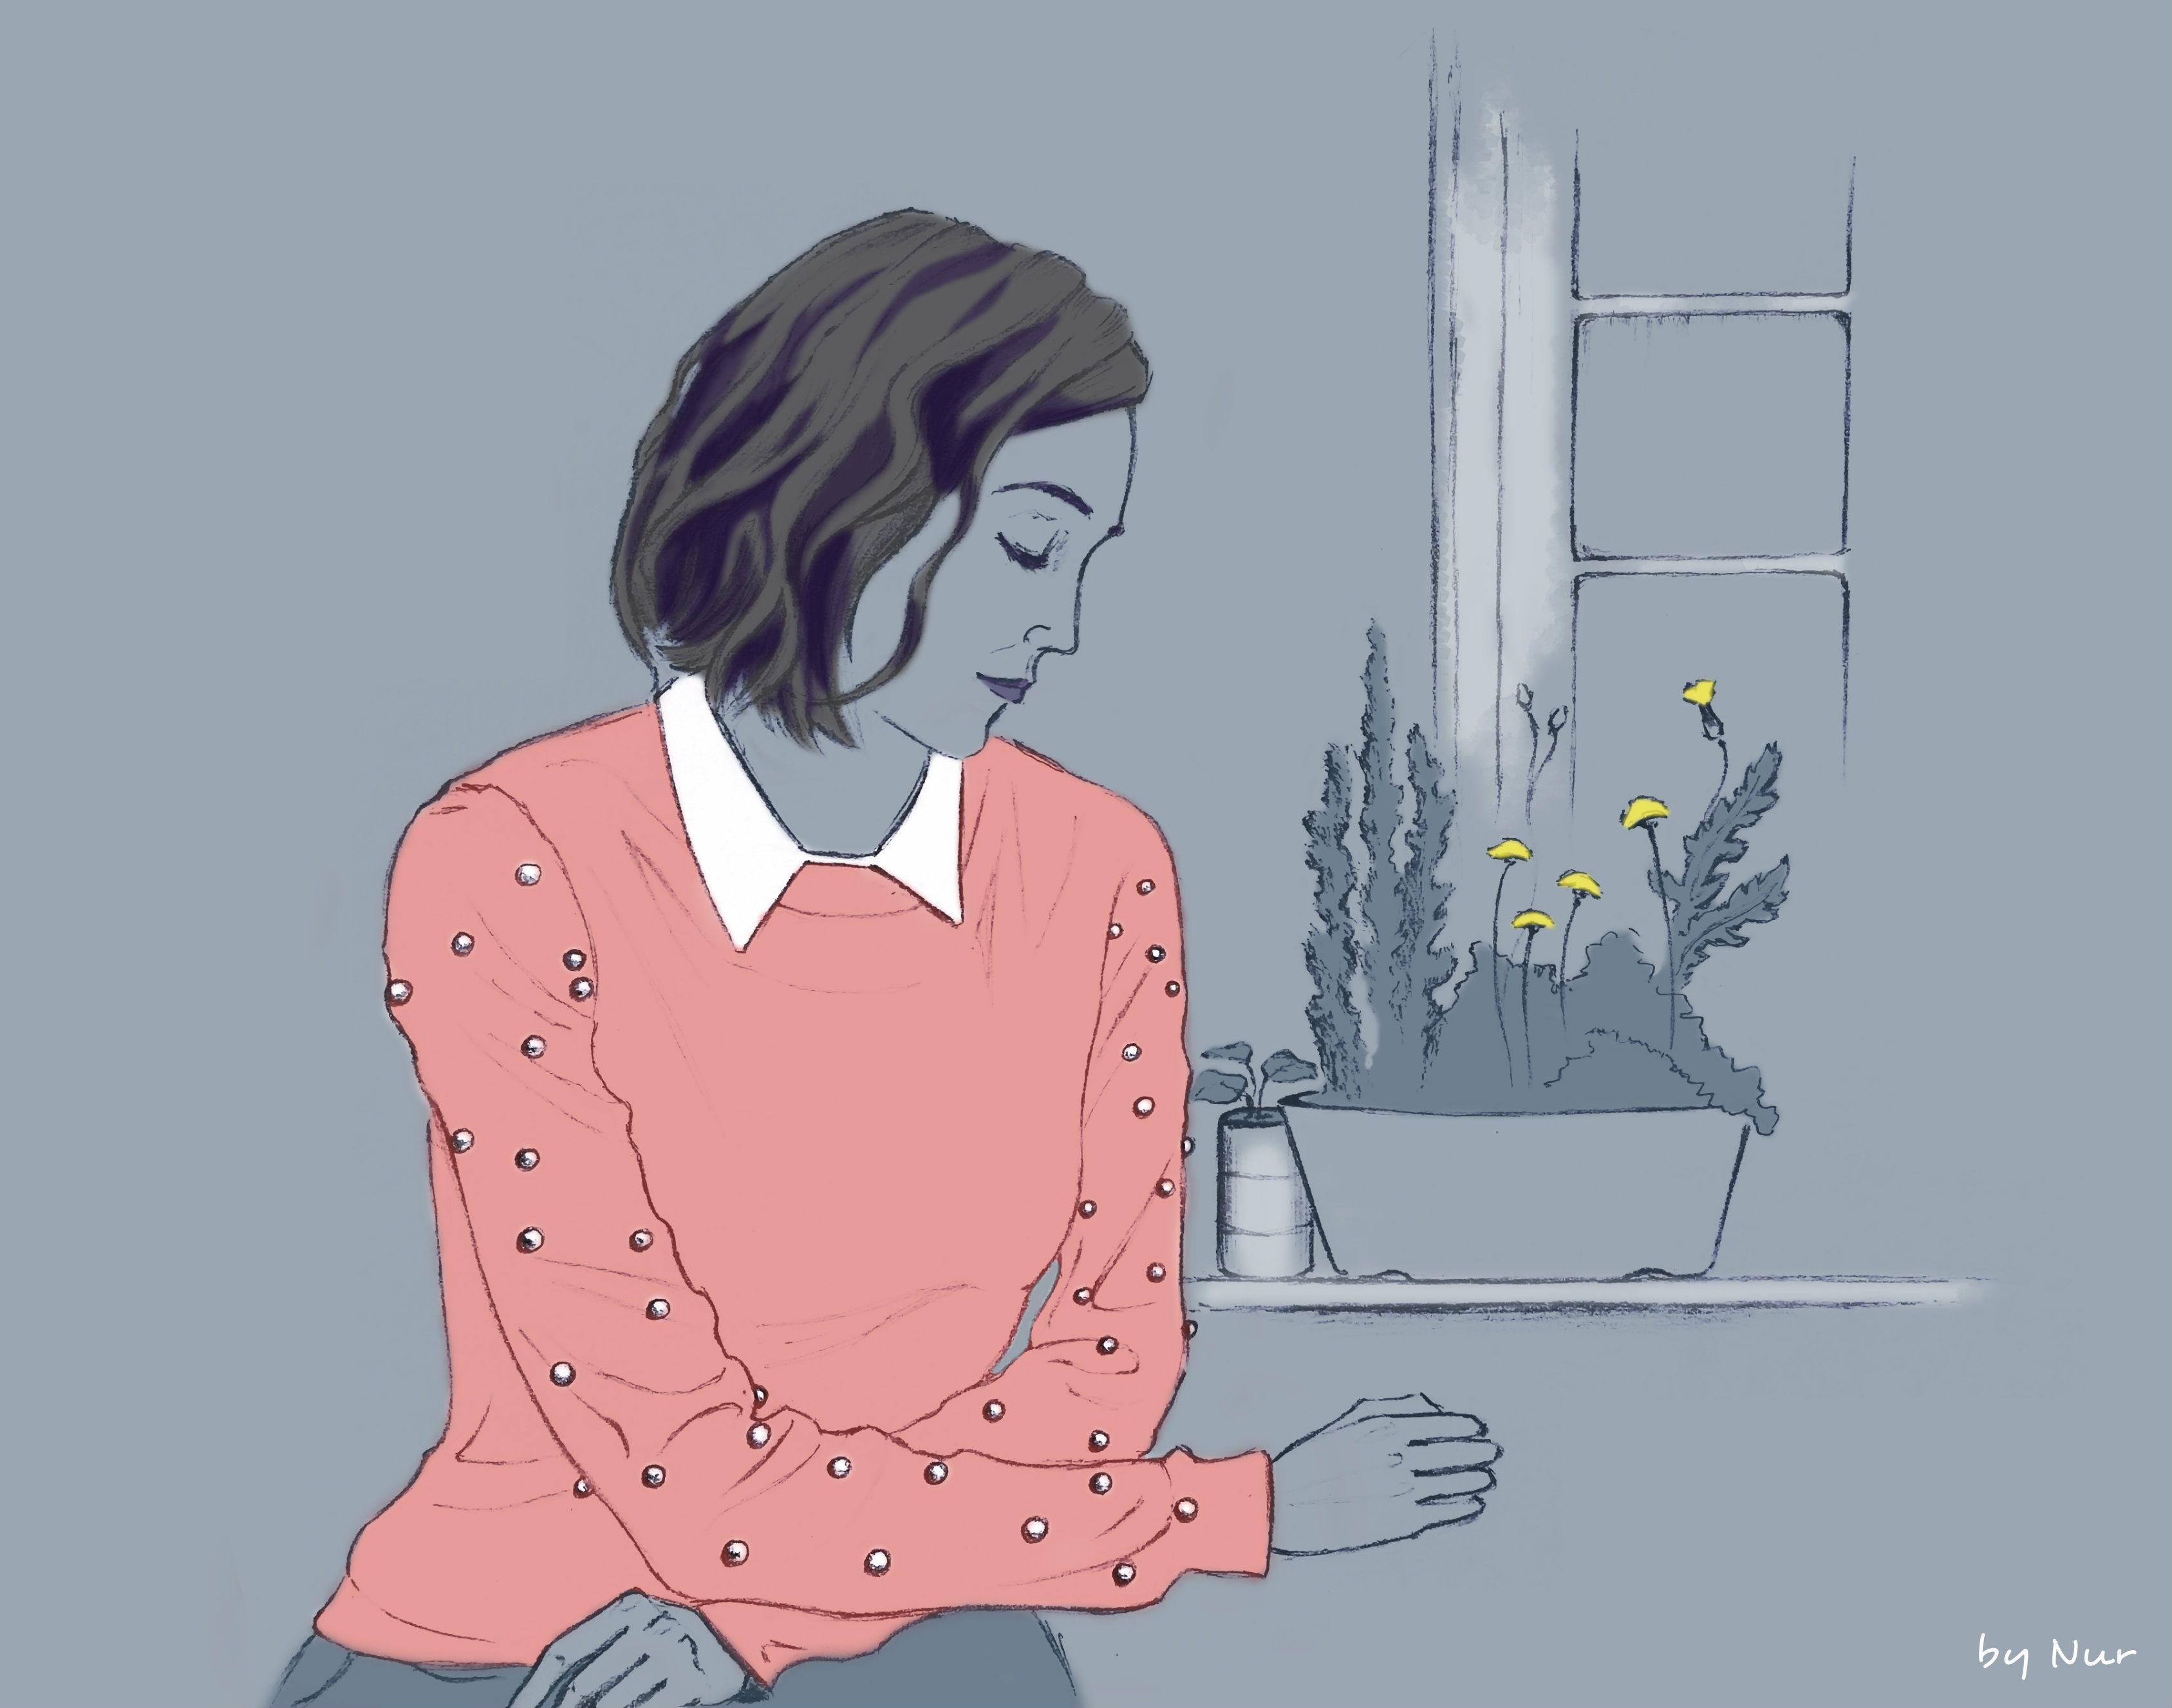 Evening blues, by Nur #illustration #art #sad